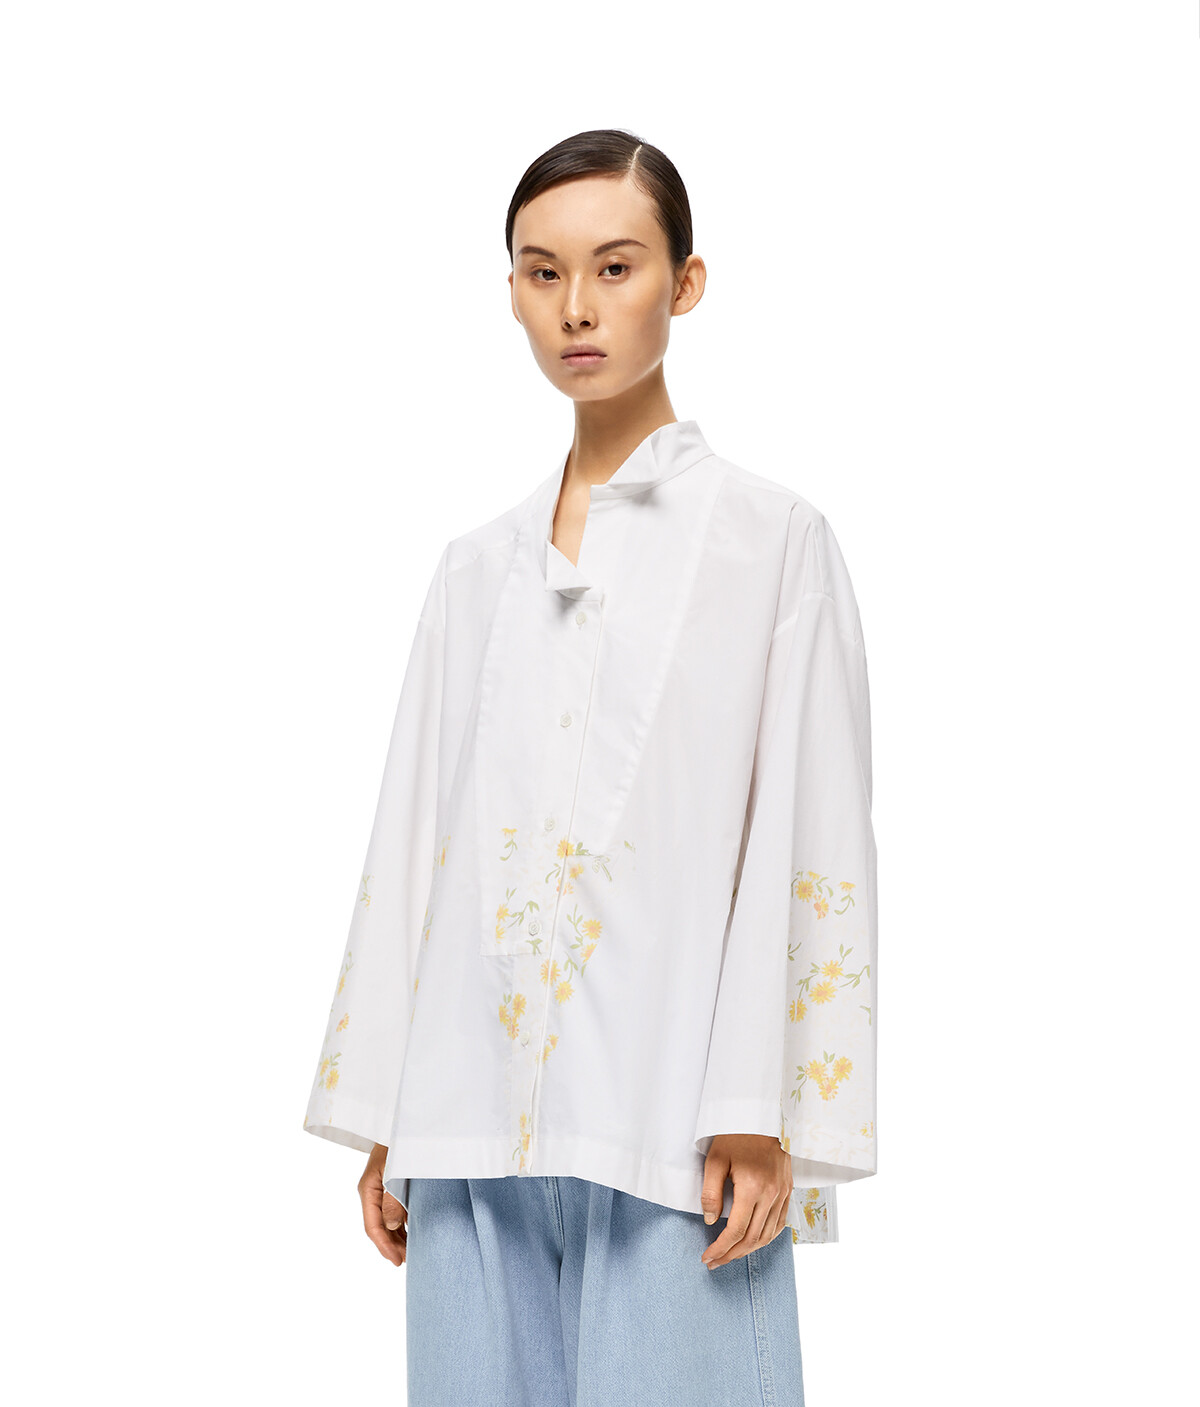 LOEWE Flower Print Asym Ov Shirt White front